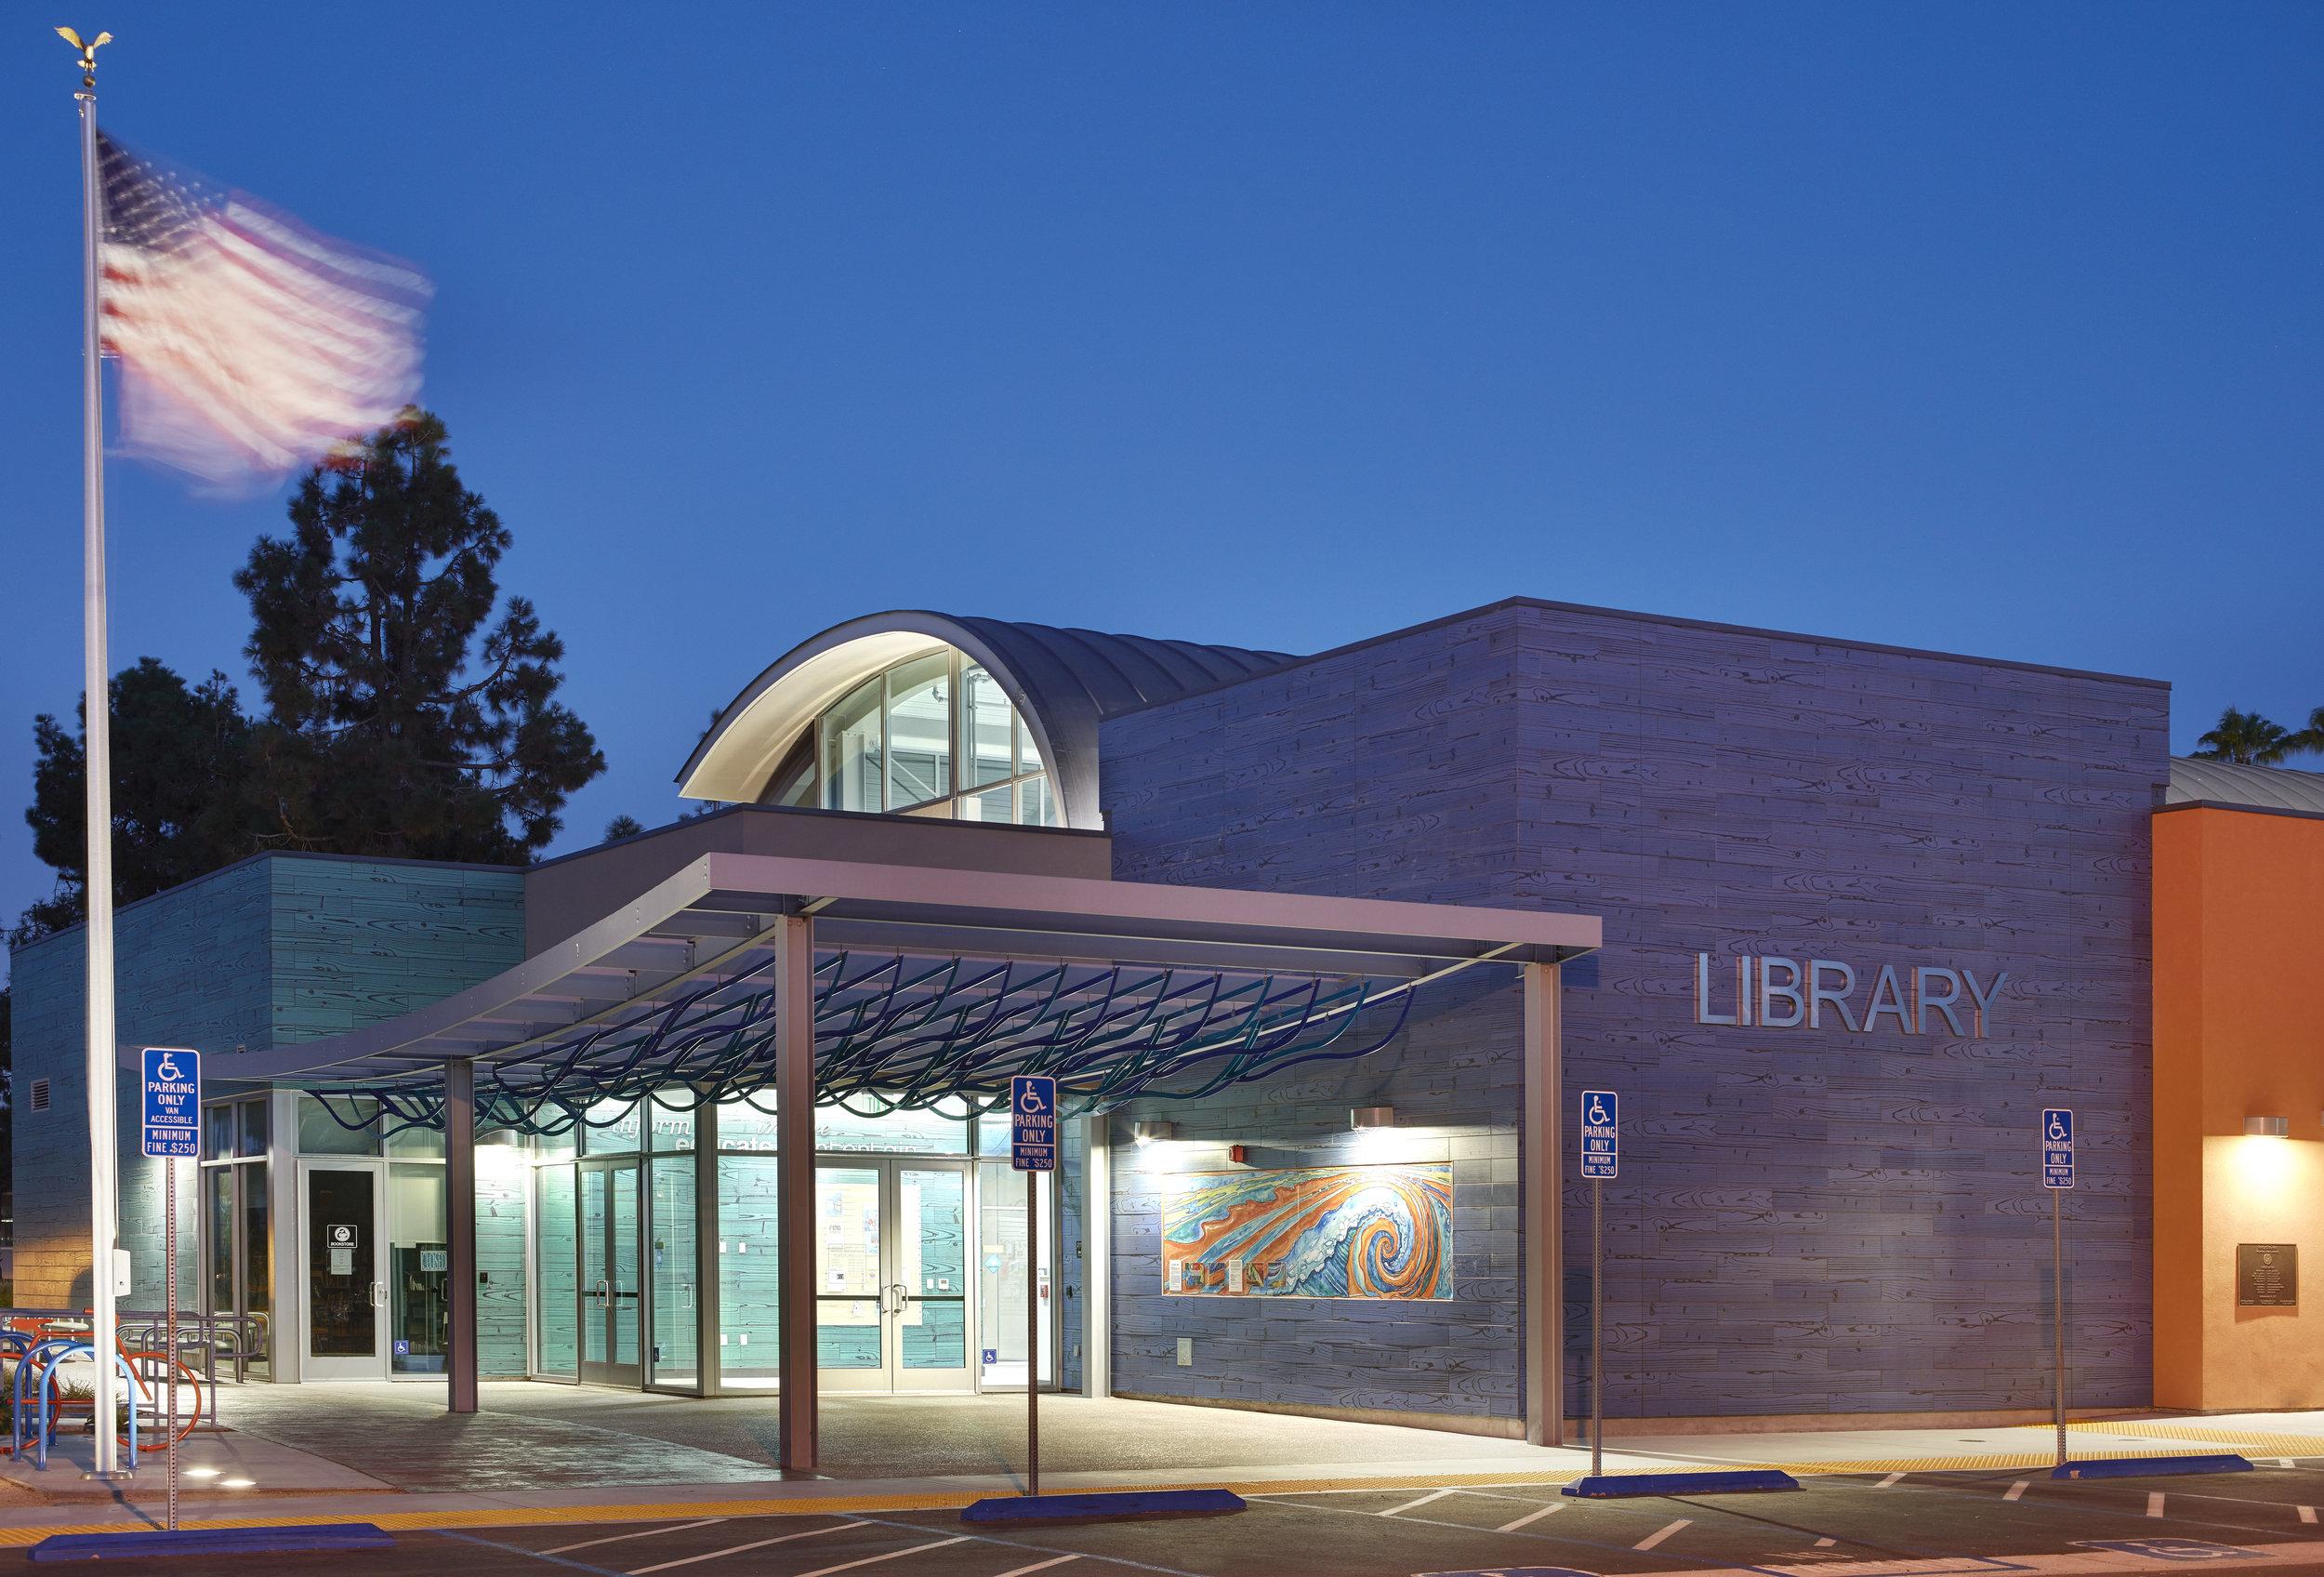 IB Library 4392.jpg